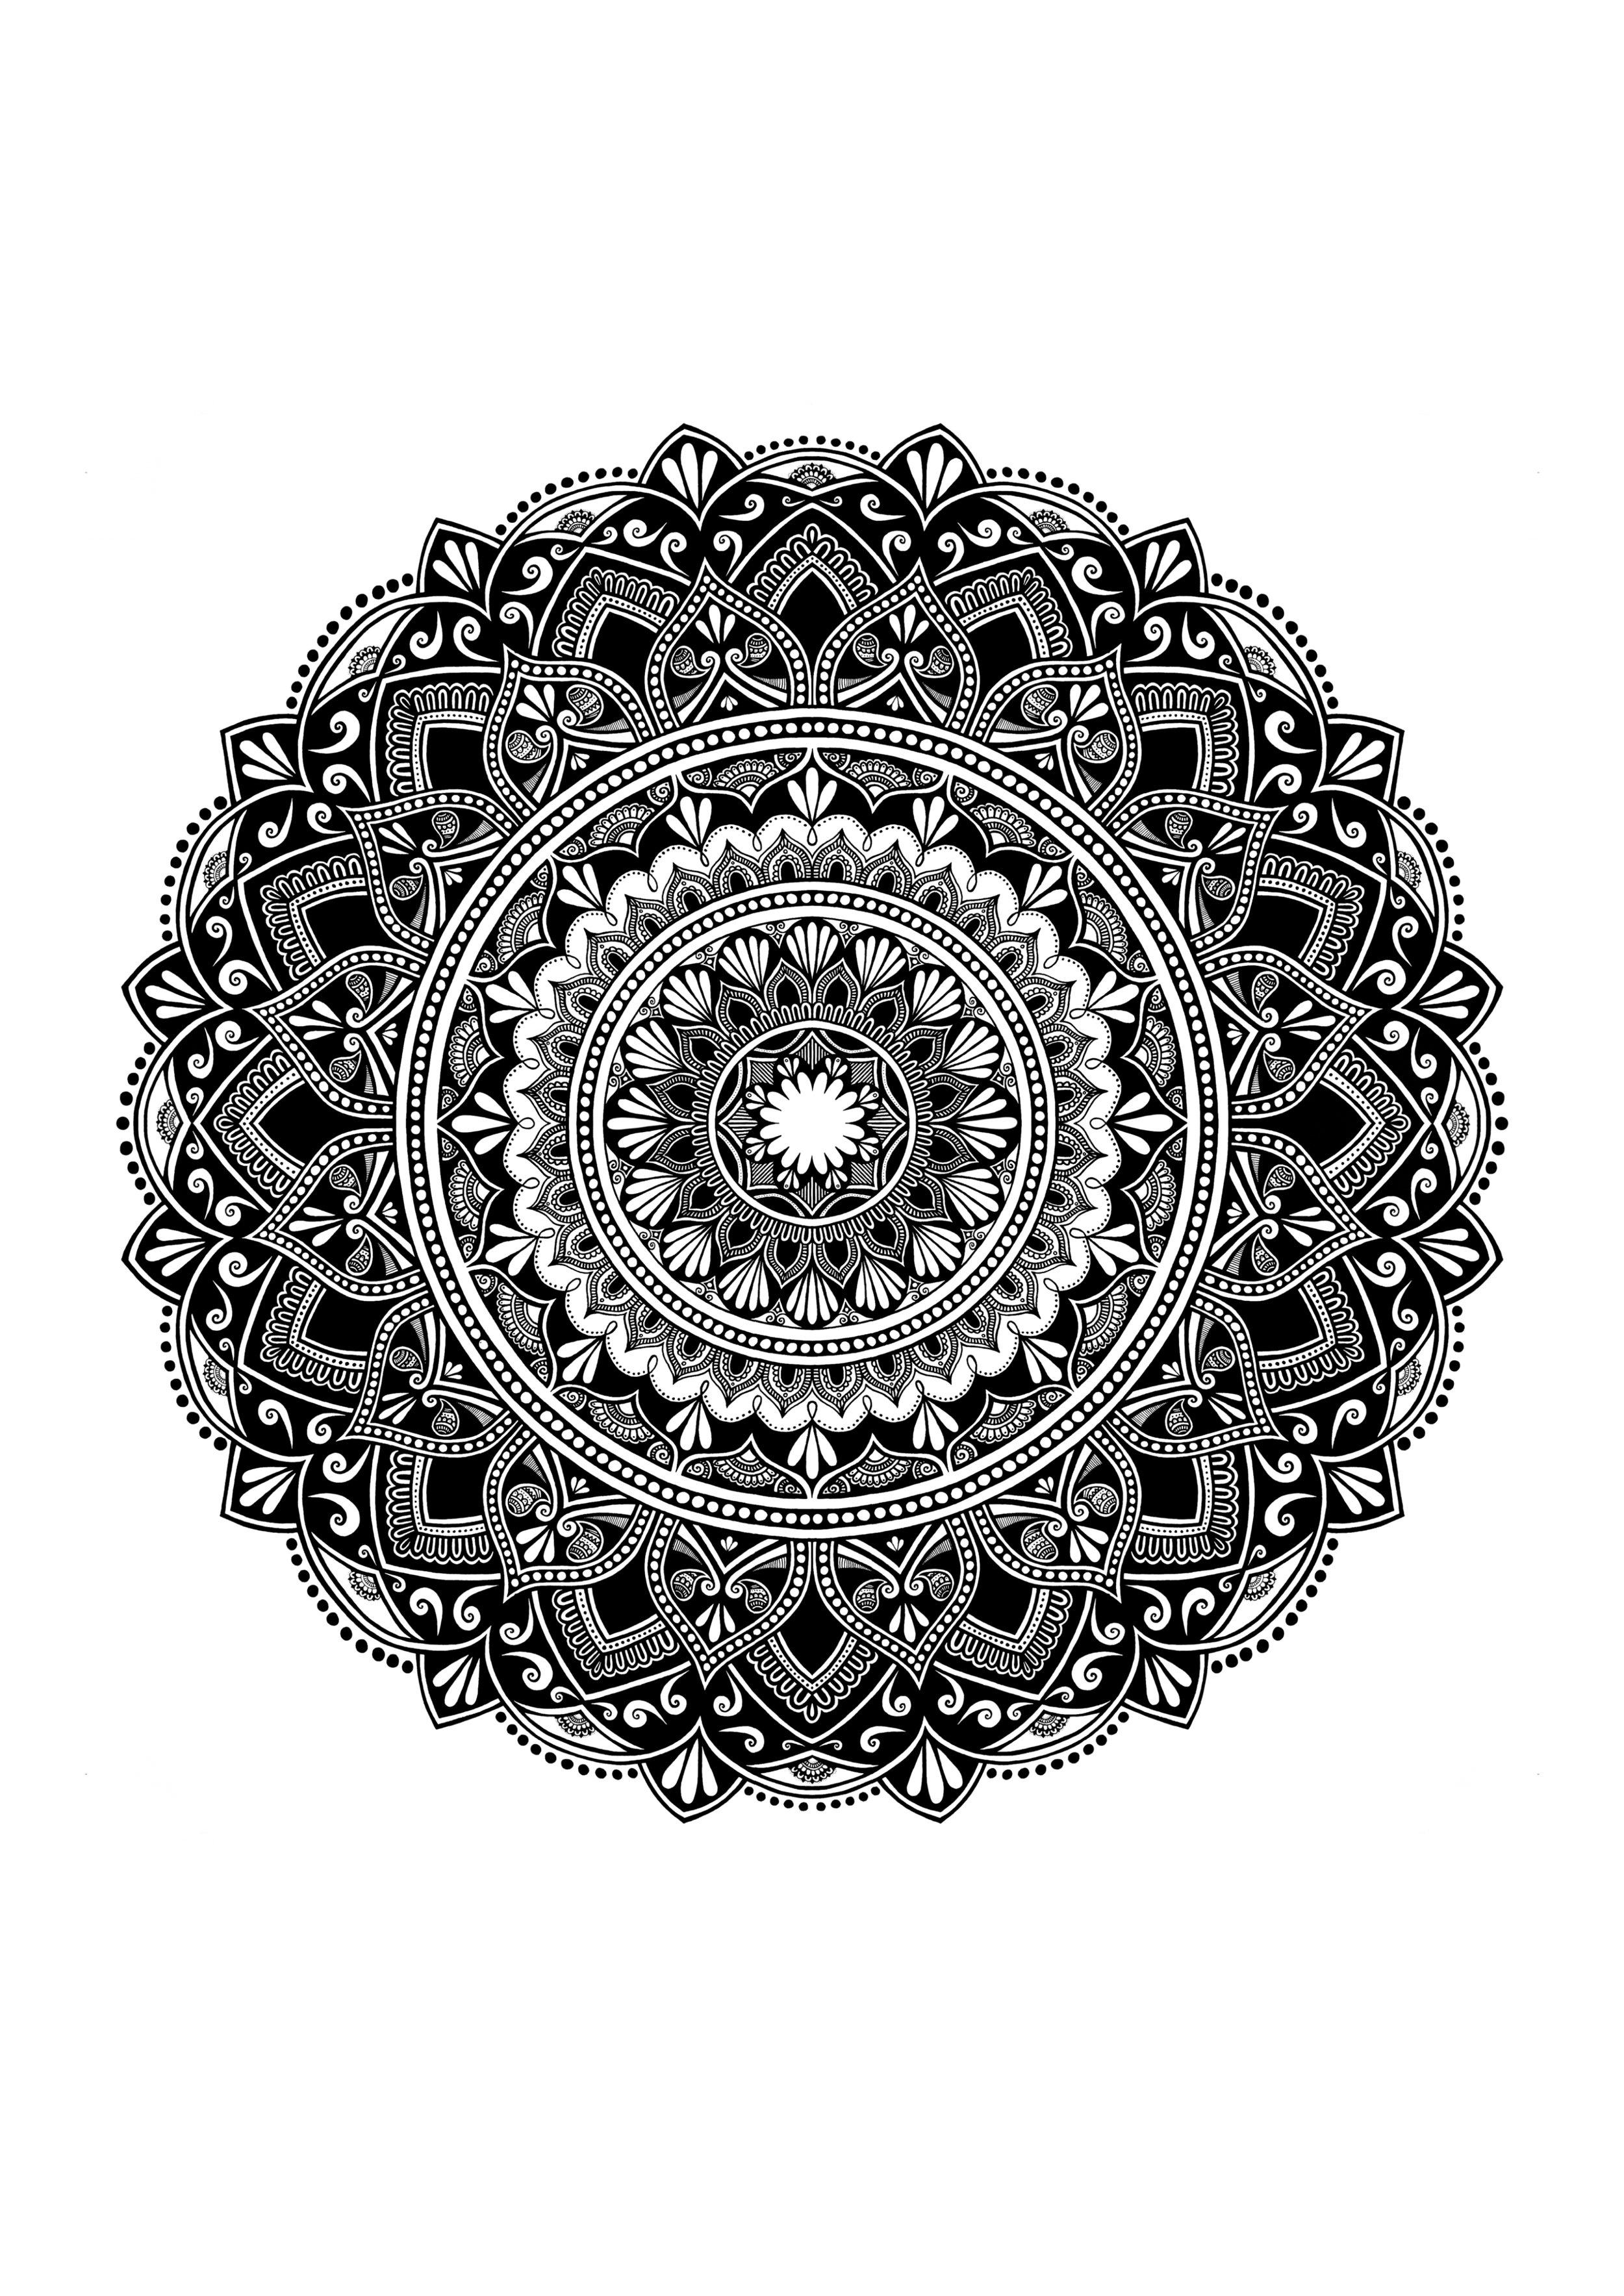 A3 Giclee x3 - Samatva Mandala.jpg